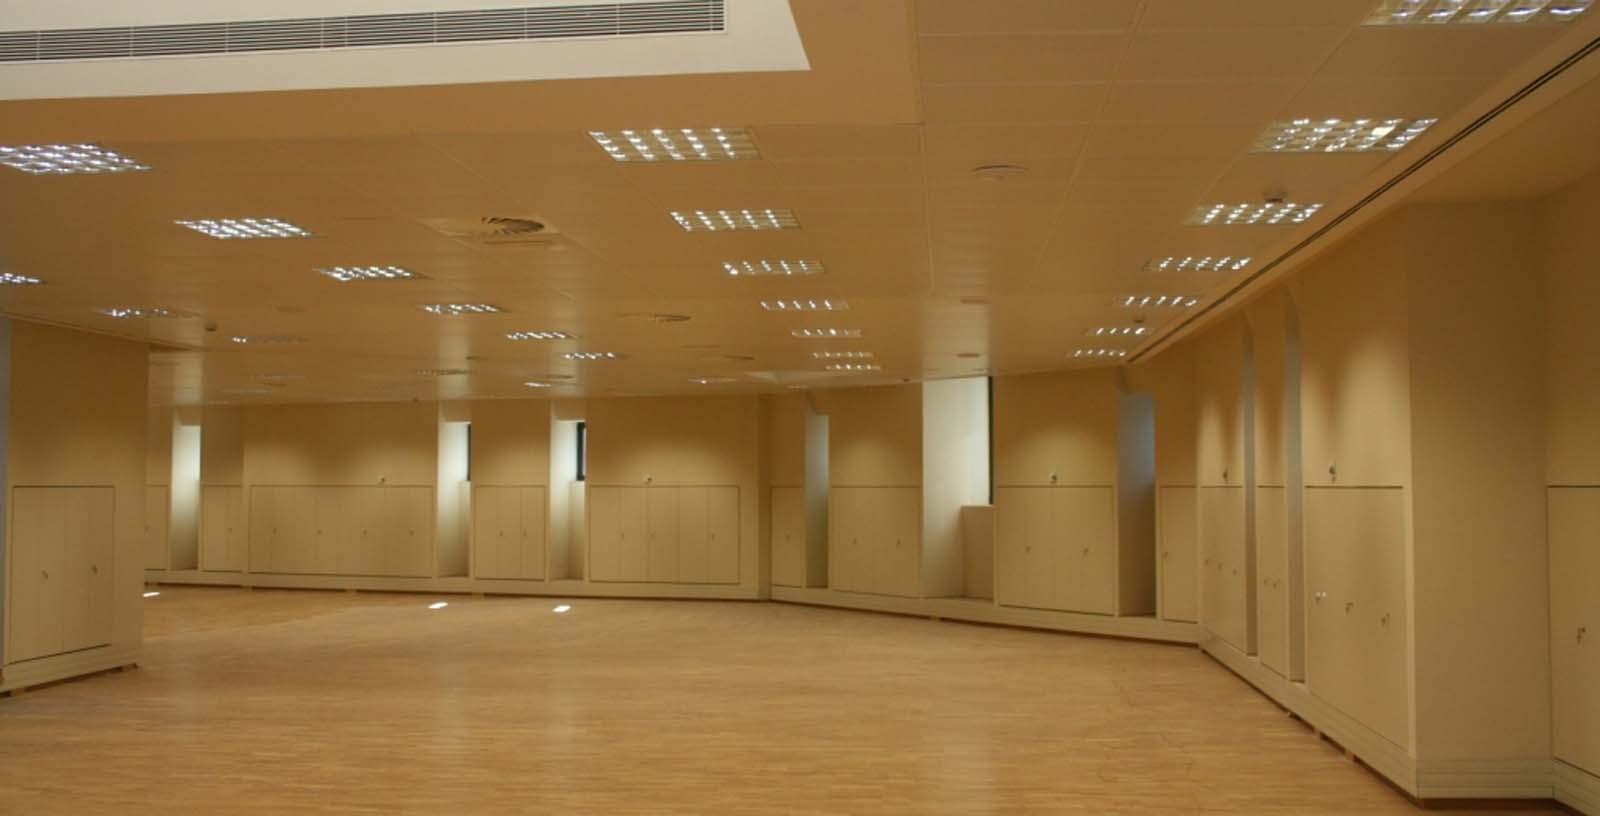 Banco_Espana_03_Building_Idom_1